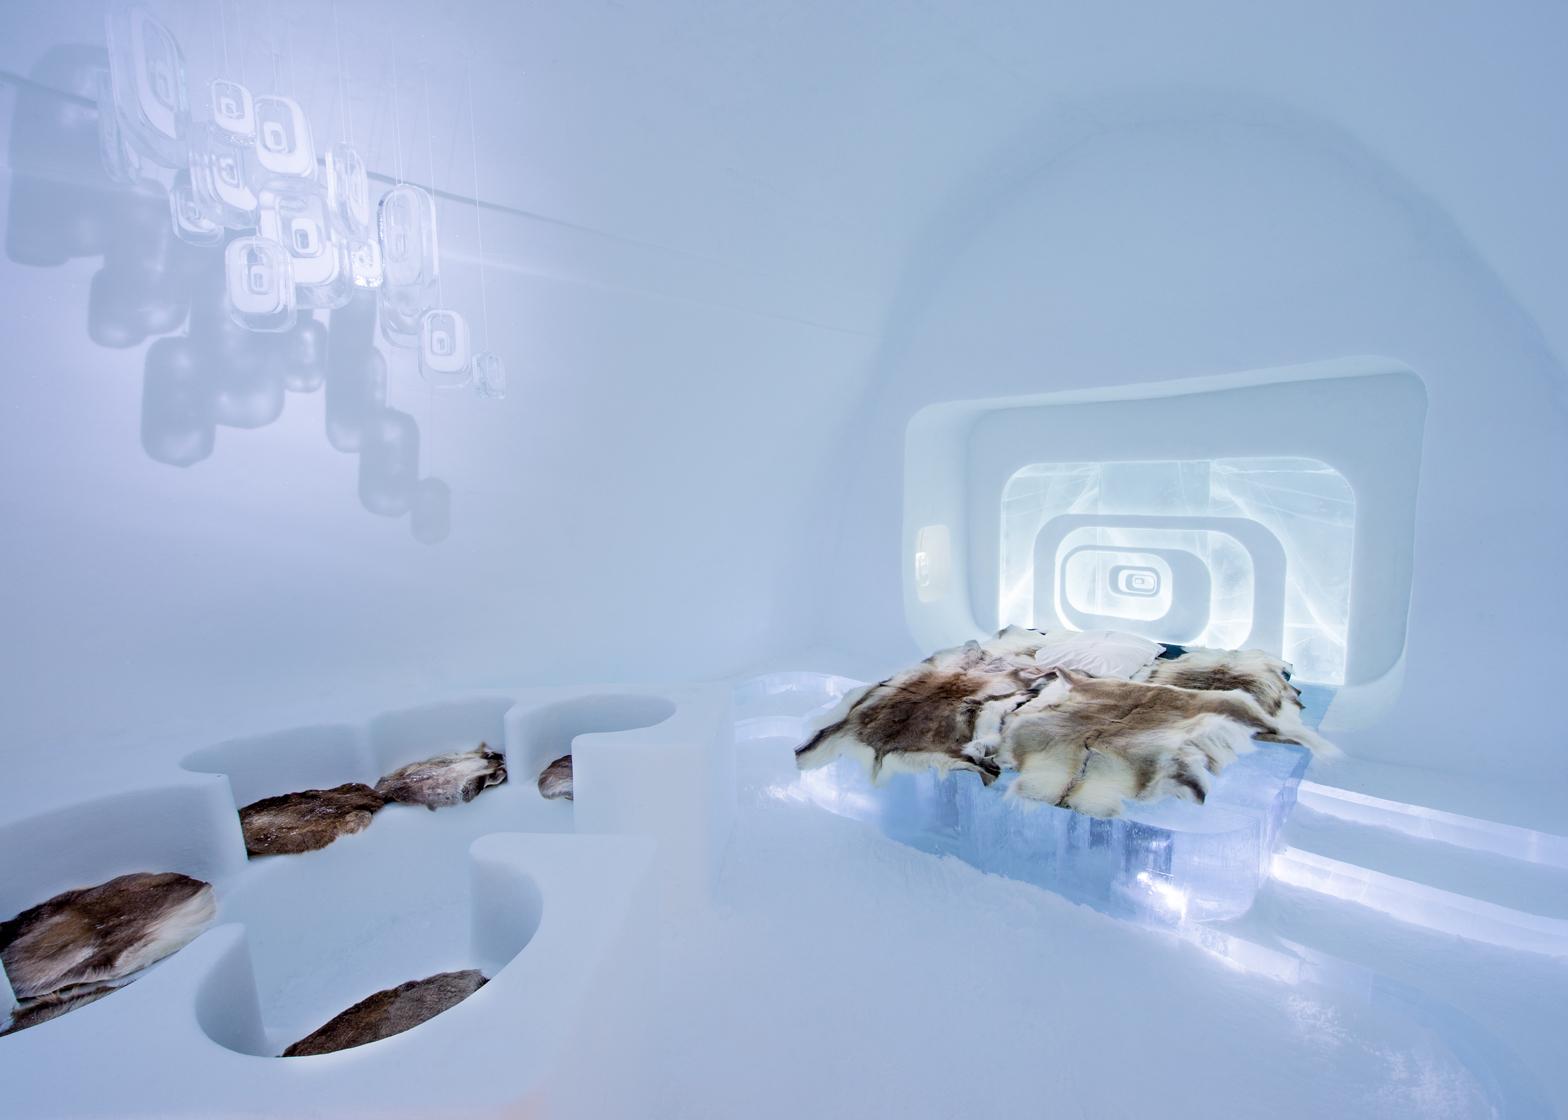 architecture-ice-hotel-design-studia-interiors-osnovadesign-osnova-poltava-04